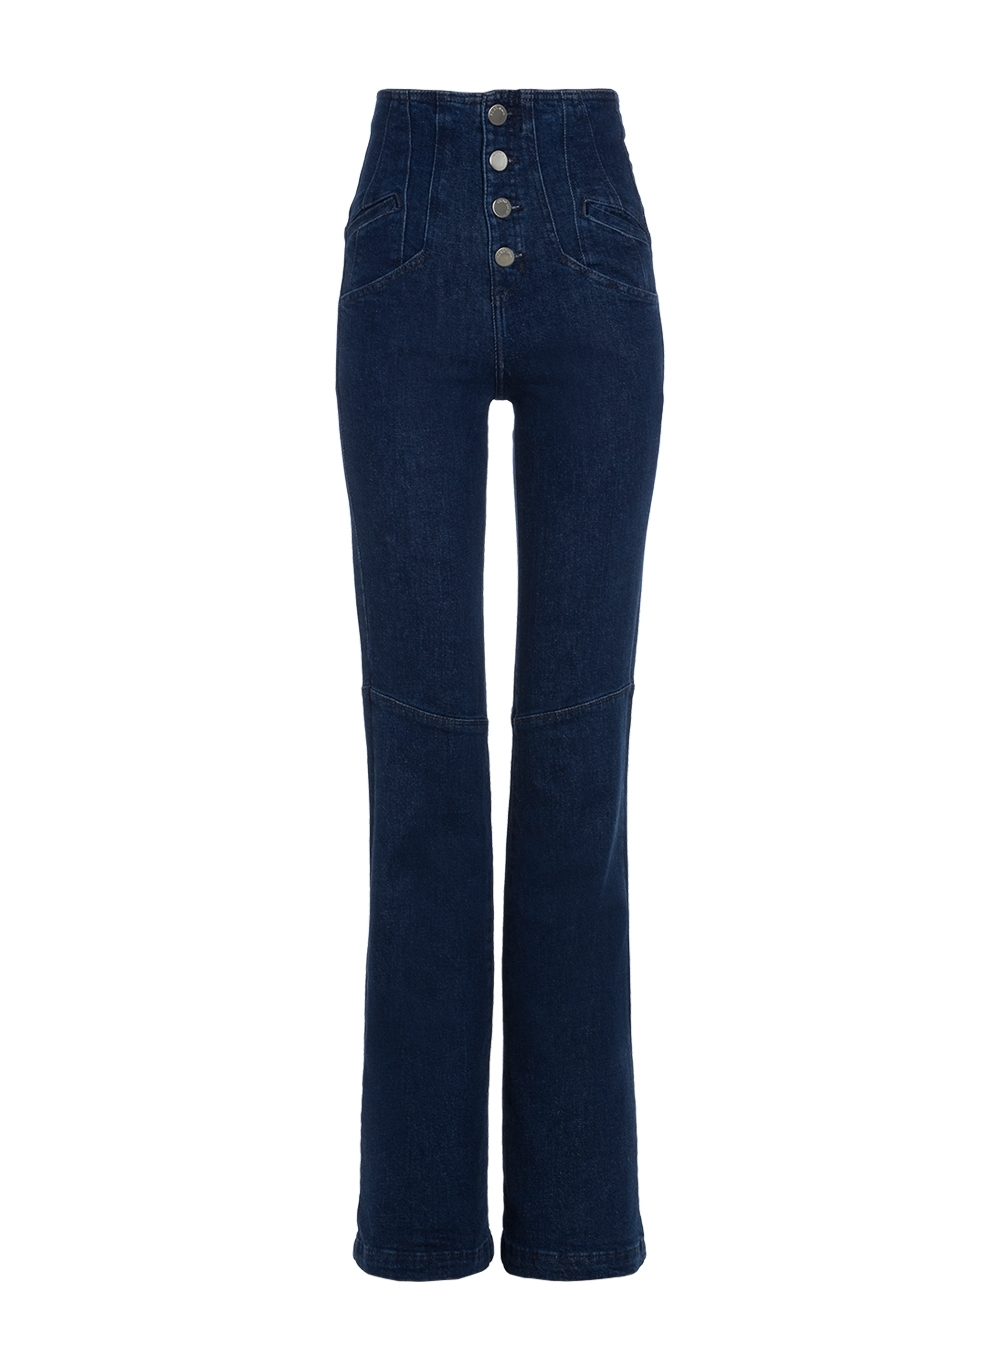 Calça Bo.bô Mari Flare Feminina (Jeans Escuro, 36)